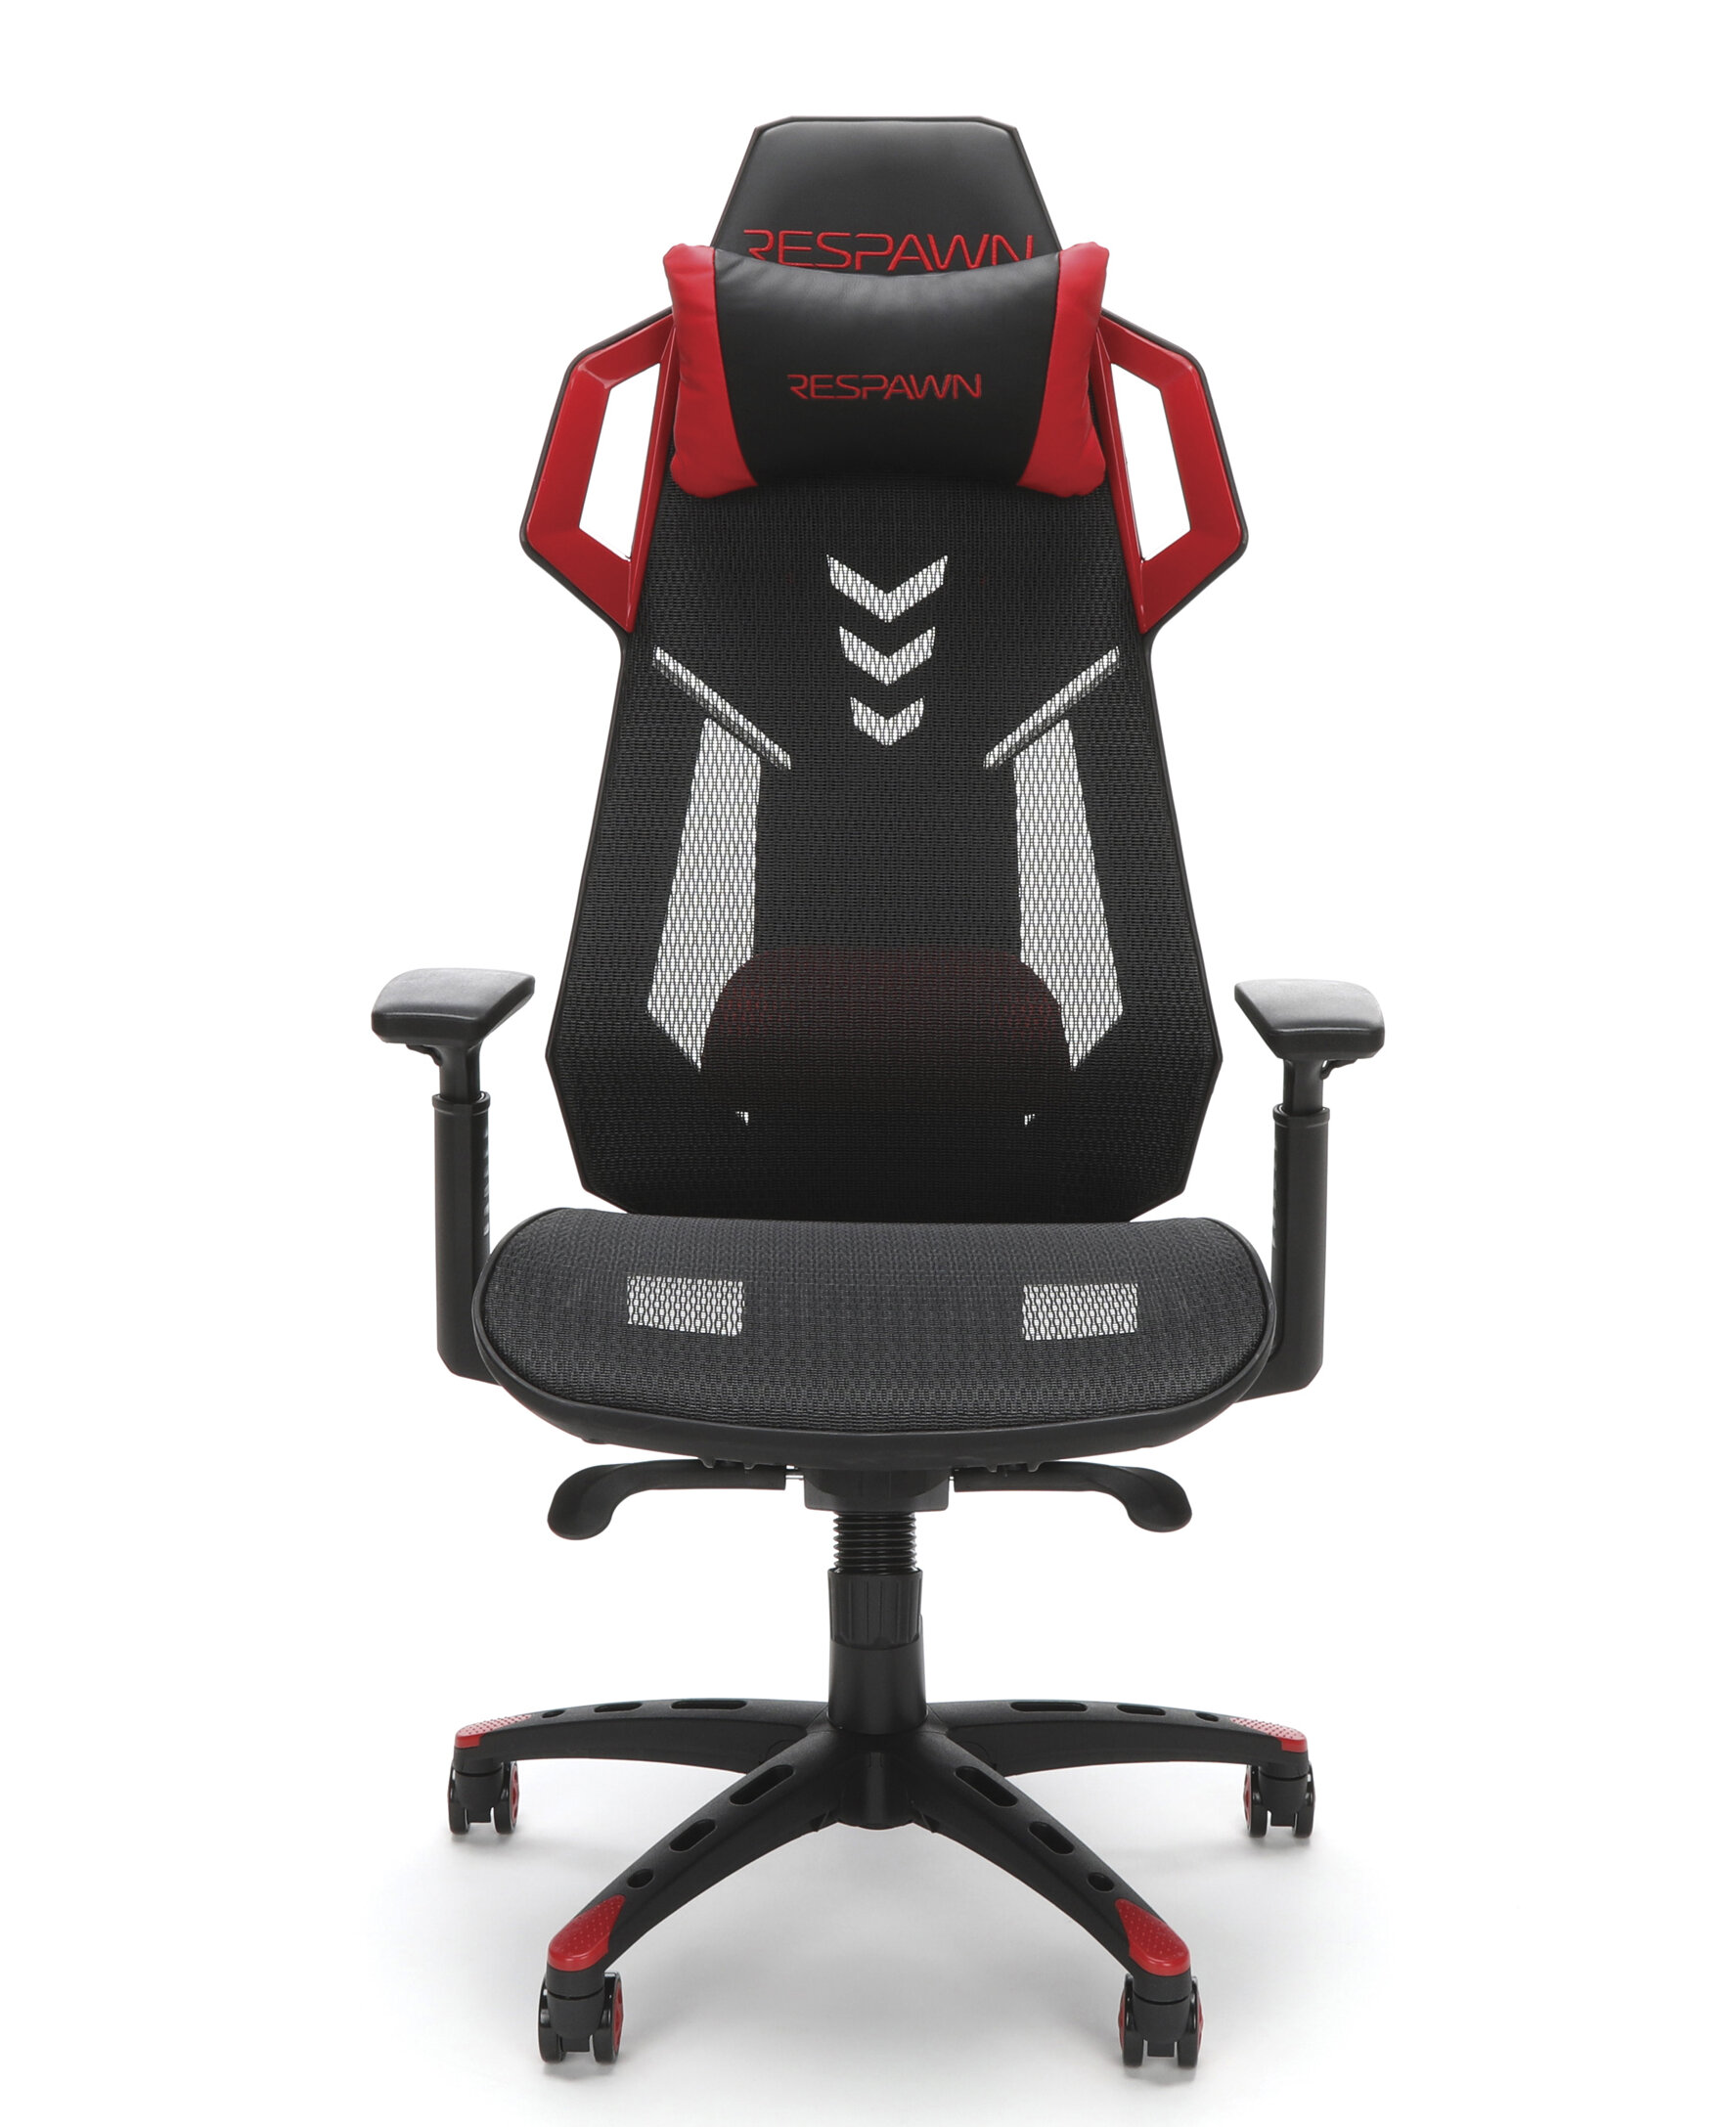 Respawn Racing Style Gaming Chair & Reviews | Wayfair